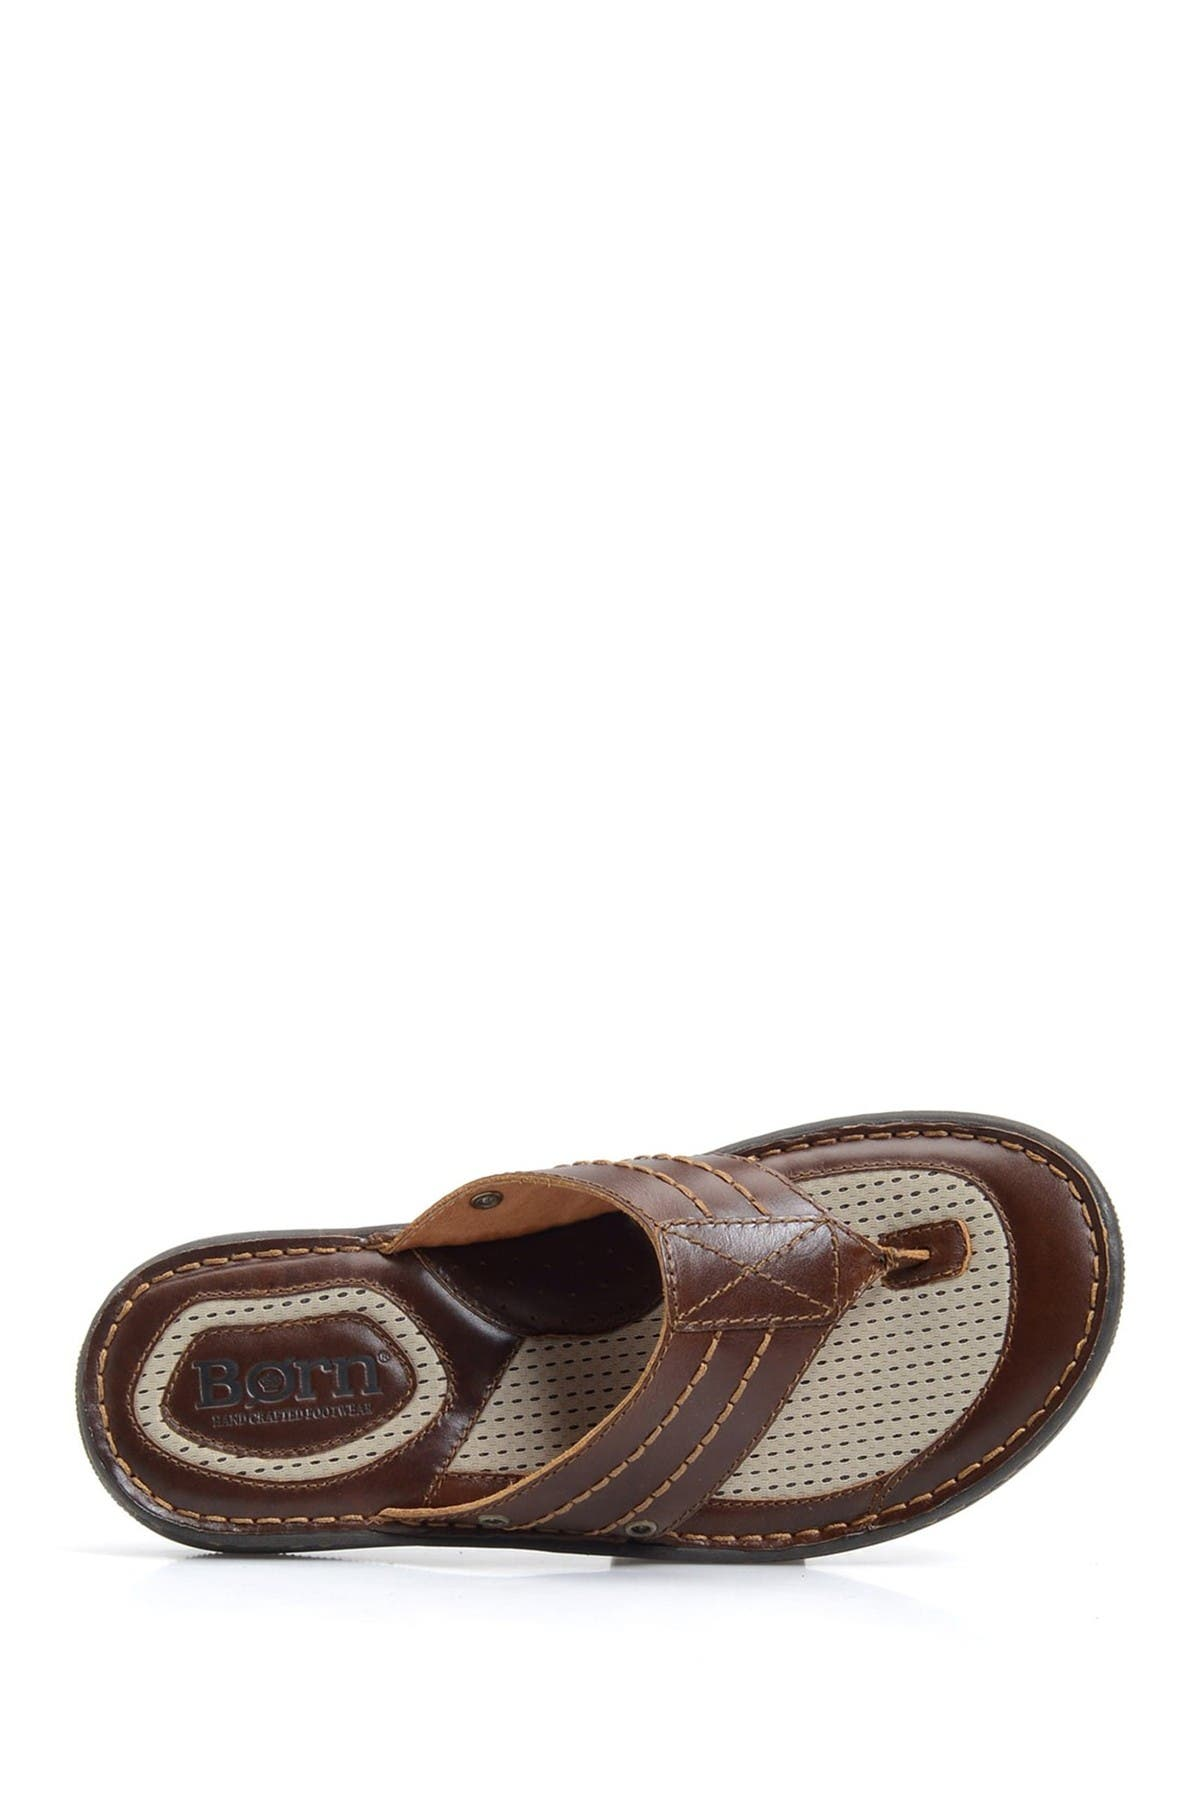 Born   Jonah Leather Flip-Flop